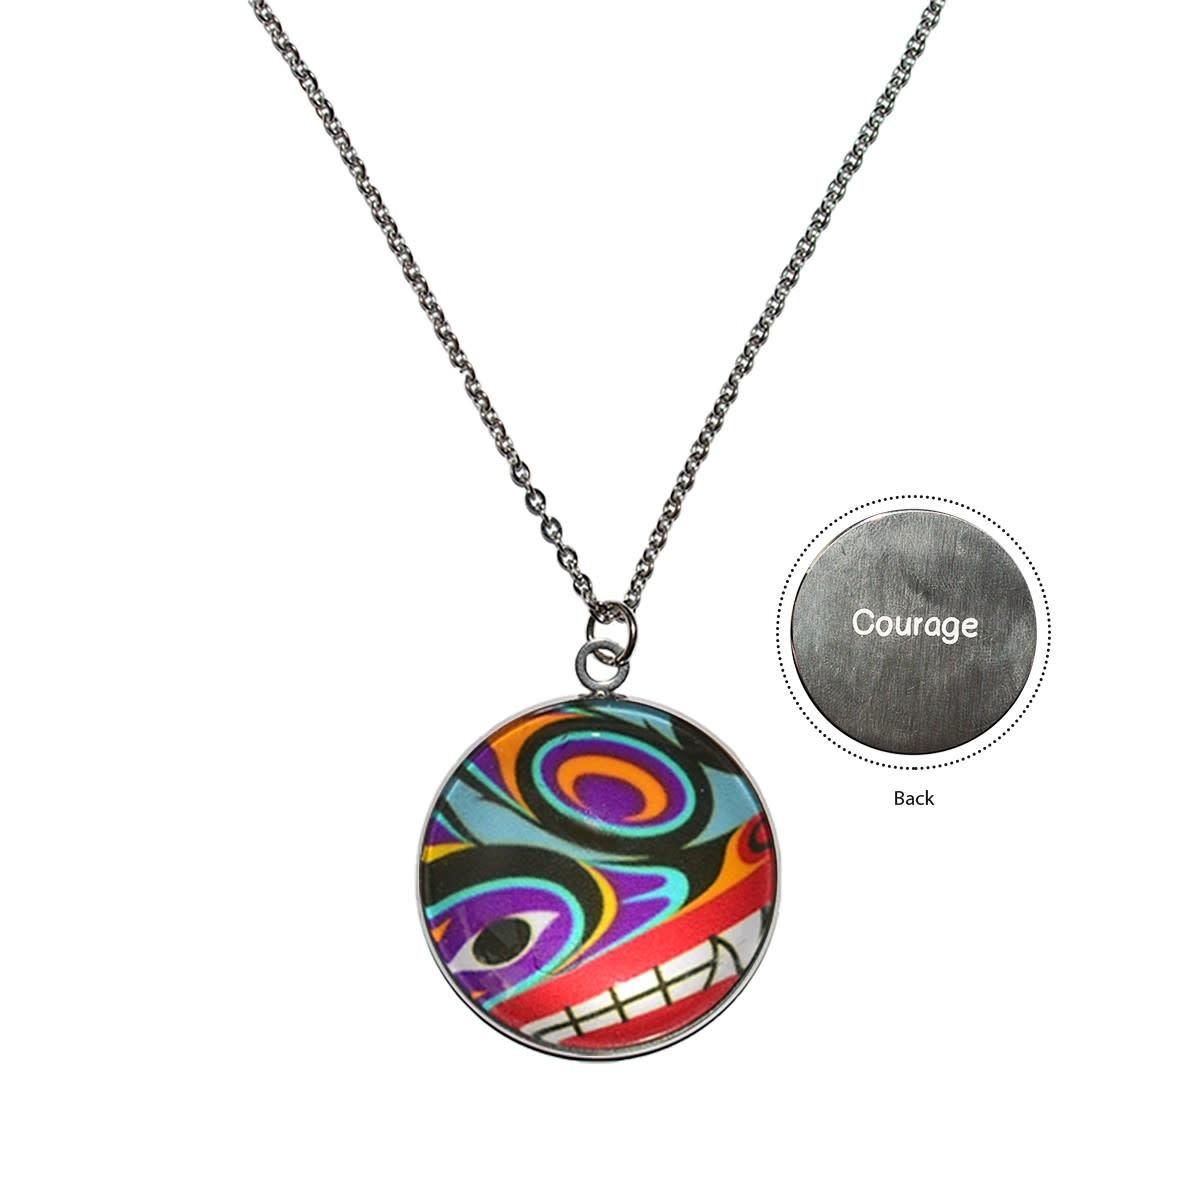 Urban Wolf Charm Necklace by Maynard Johnny-1